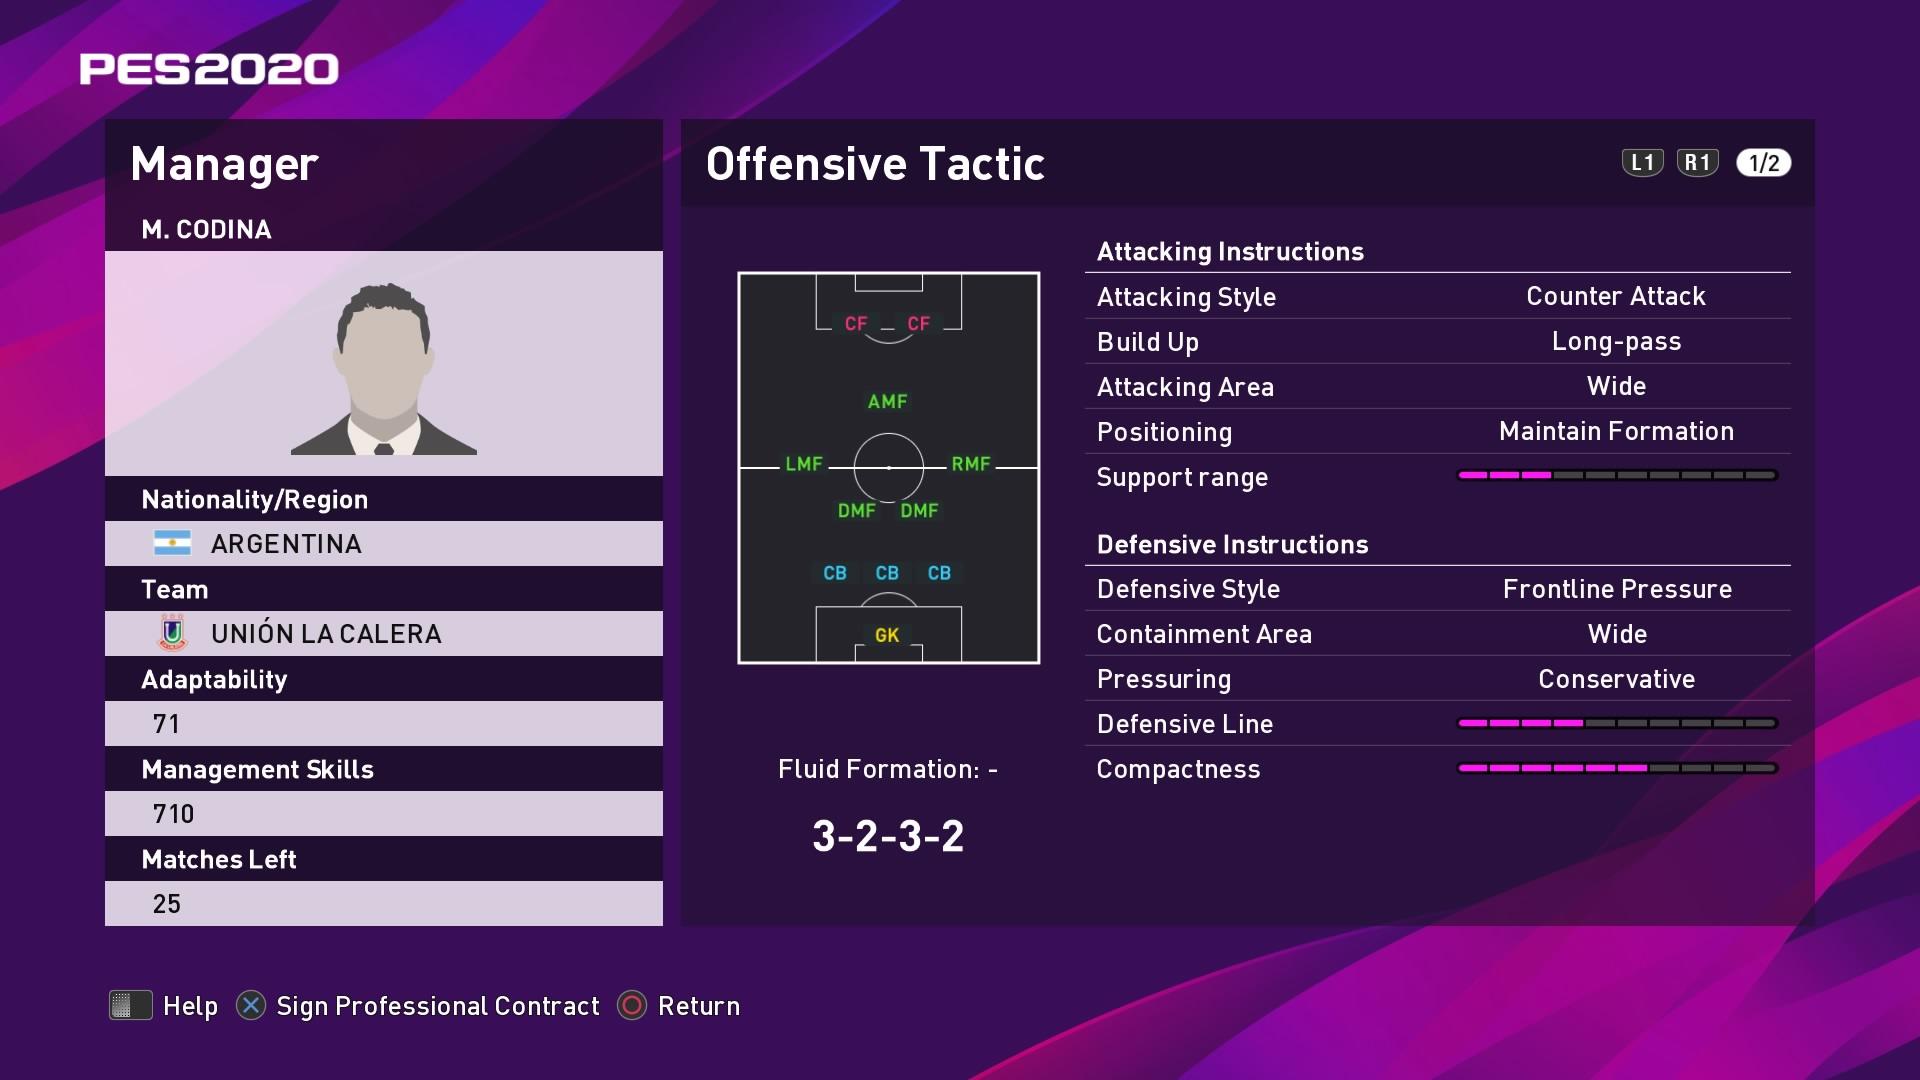 M. Codina (Juan Pablo Vojvoda) Offensive Tactic in PES 2020 myClub